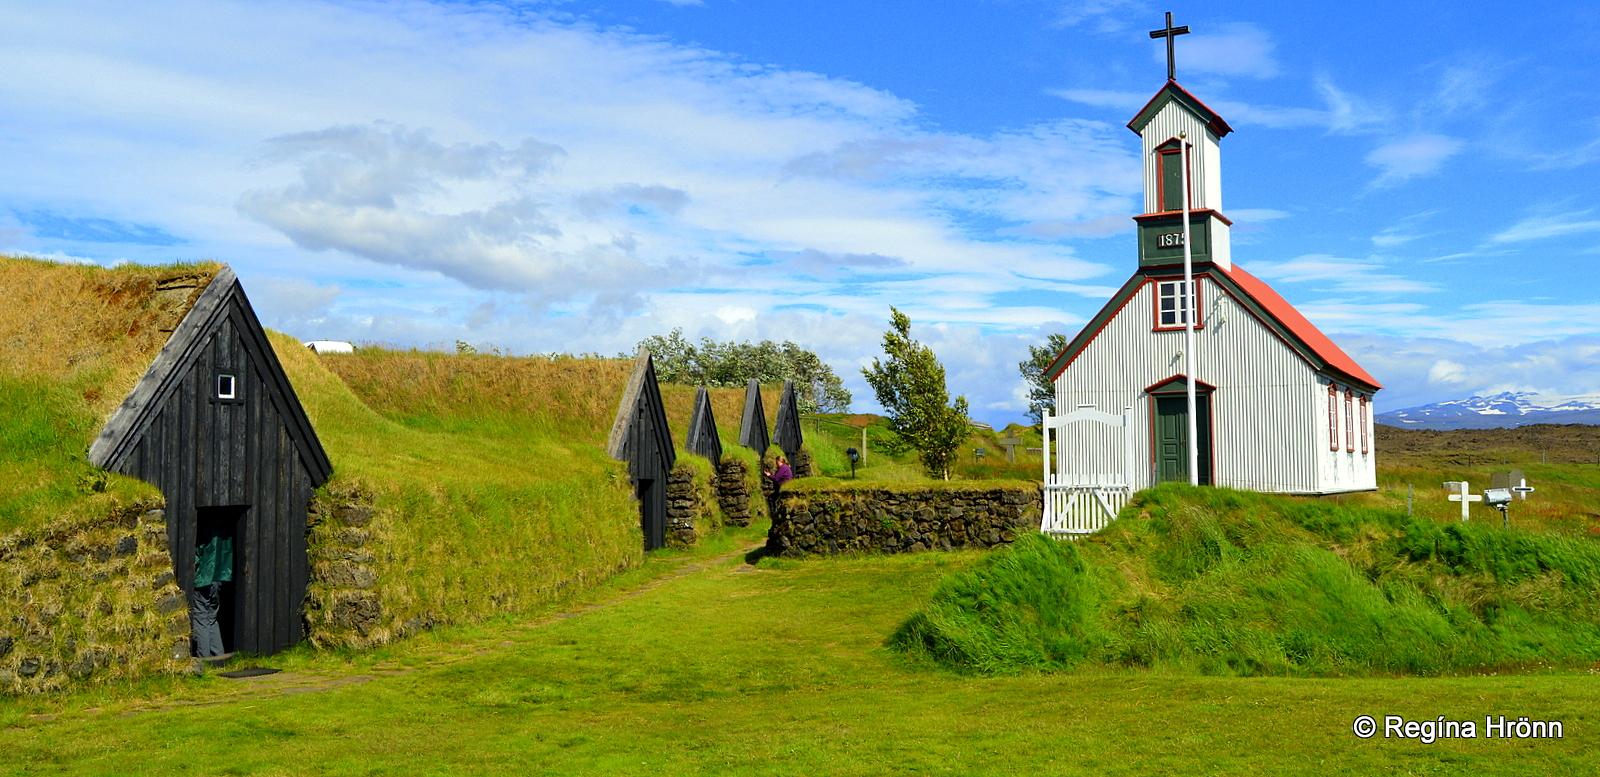 keldur-turf-house-in-south-iceland-is-this-the-oldest-house-in-iceland-1.jpg